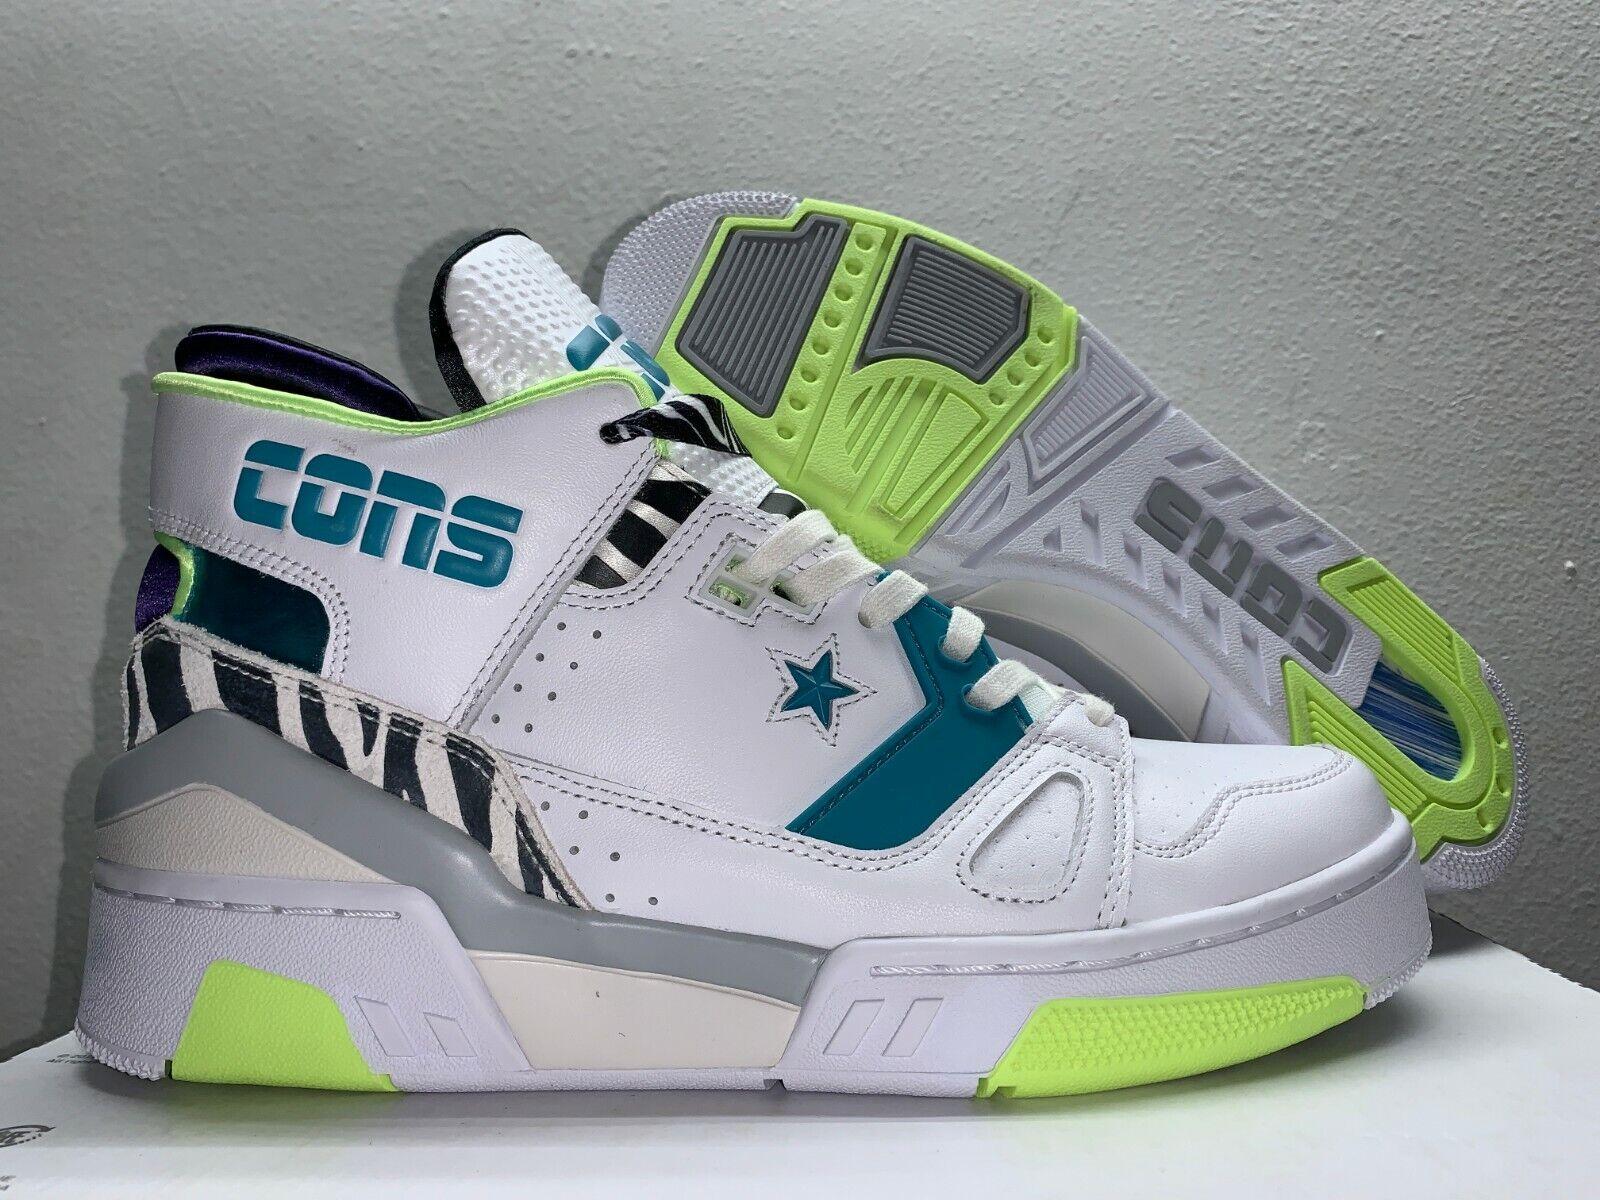 Converse X Don C Erx 260 260 260 Tier Schuhe Weiß Rapid